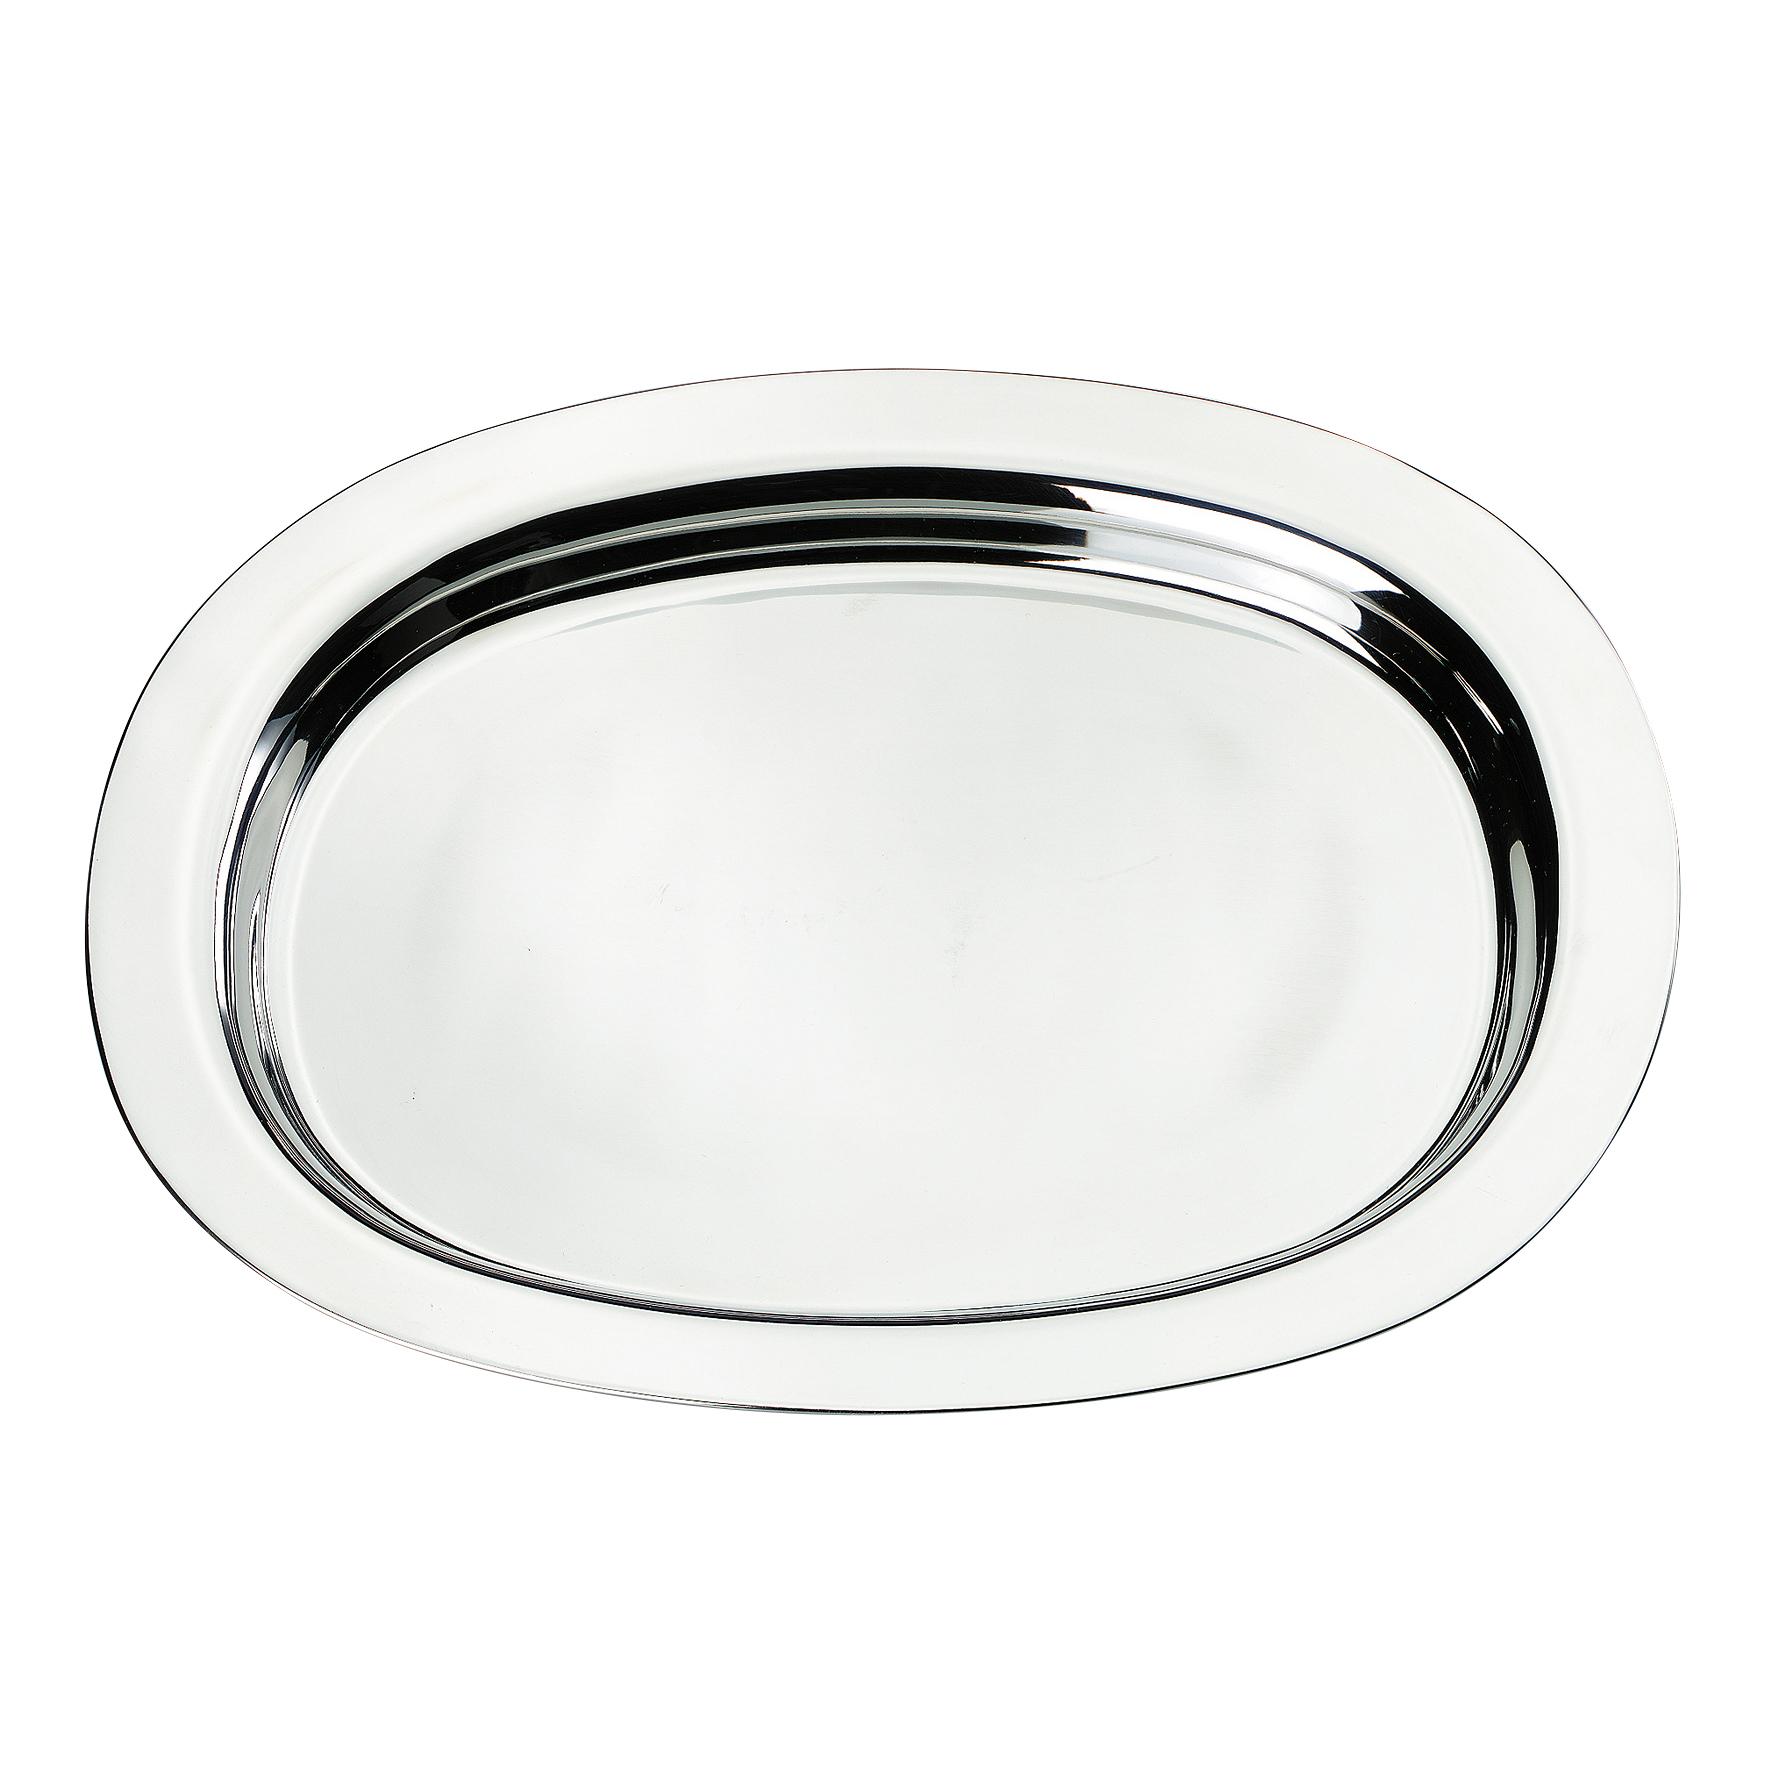 servierplatte oval edelstahl servier platte serviertablett. Black Bedroom Furniture Sets. Home Design Ideas